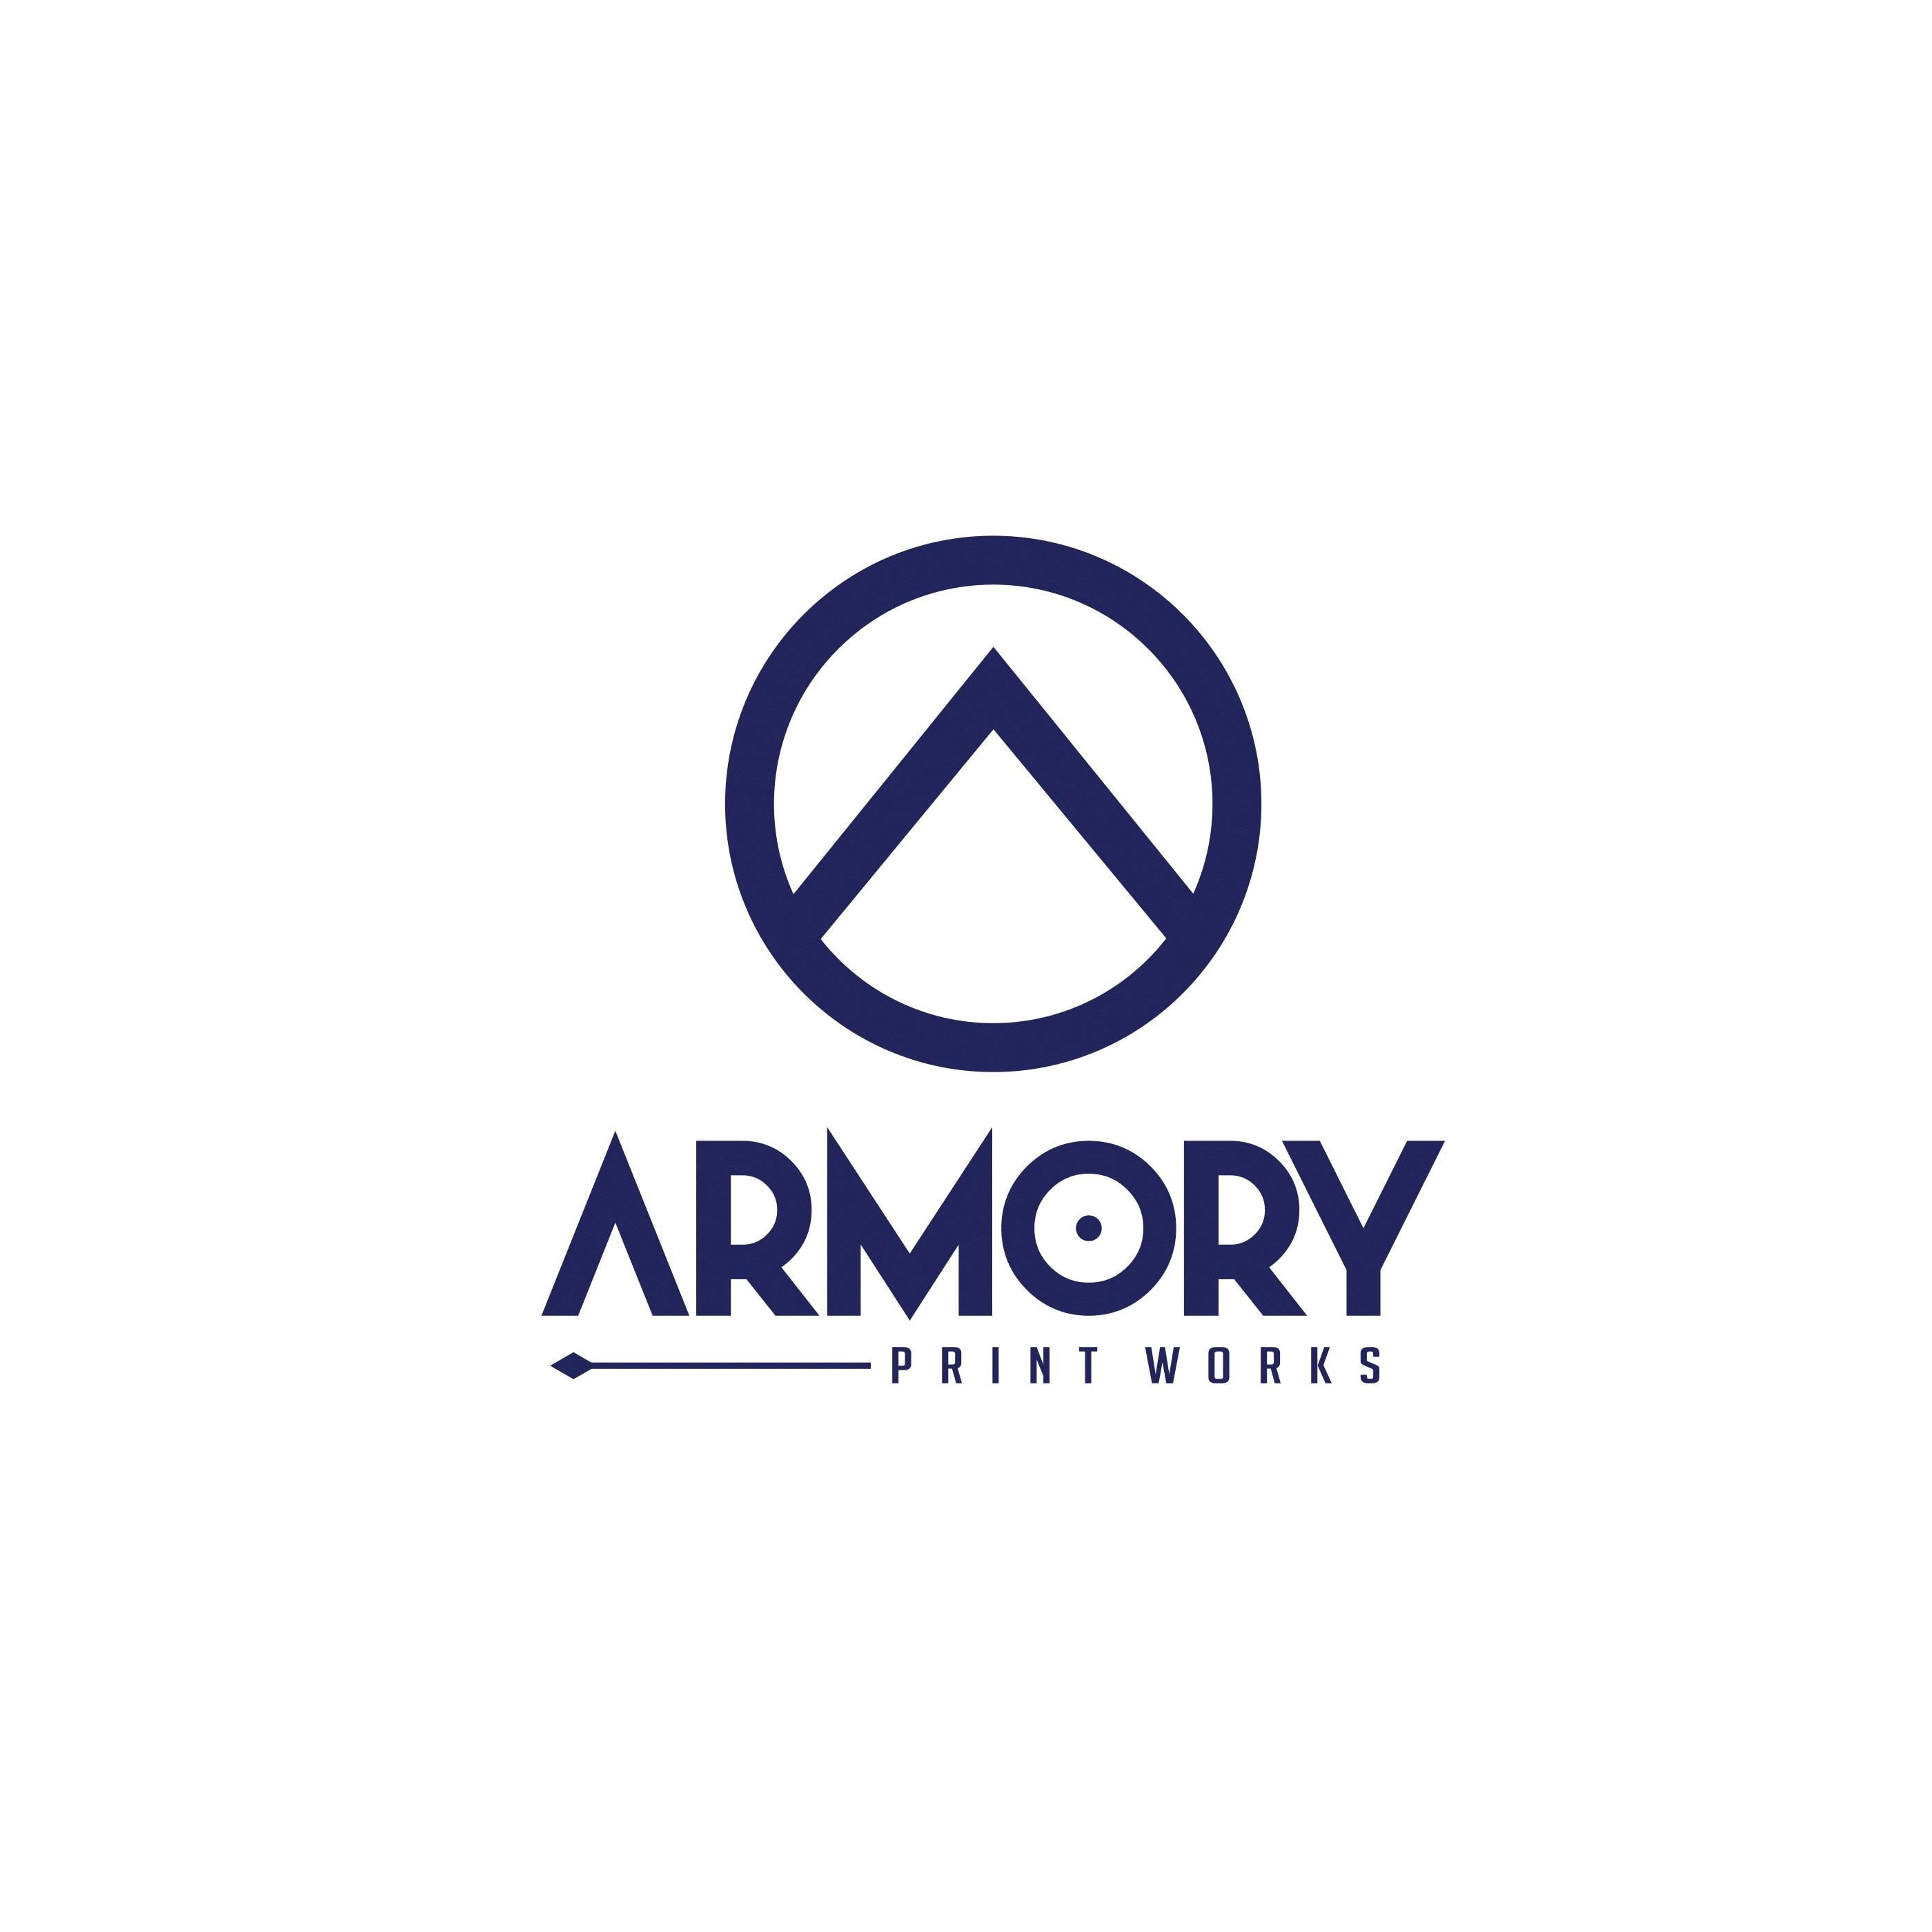 Armory Print Works